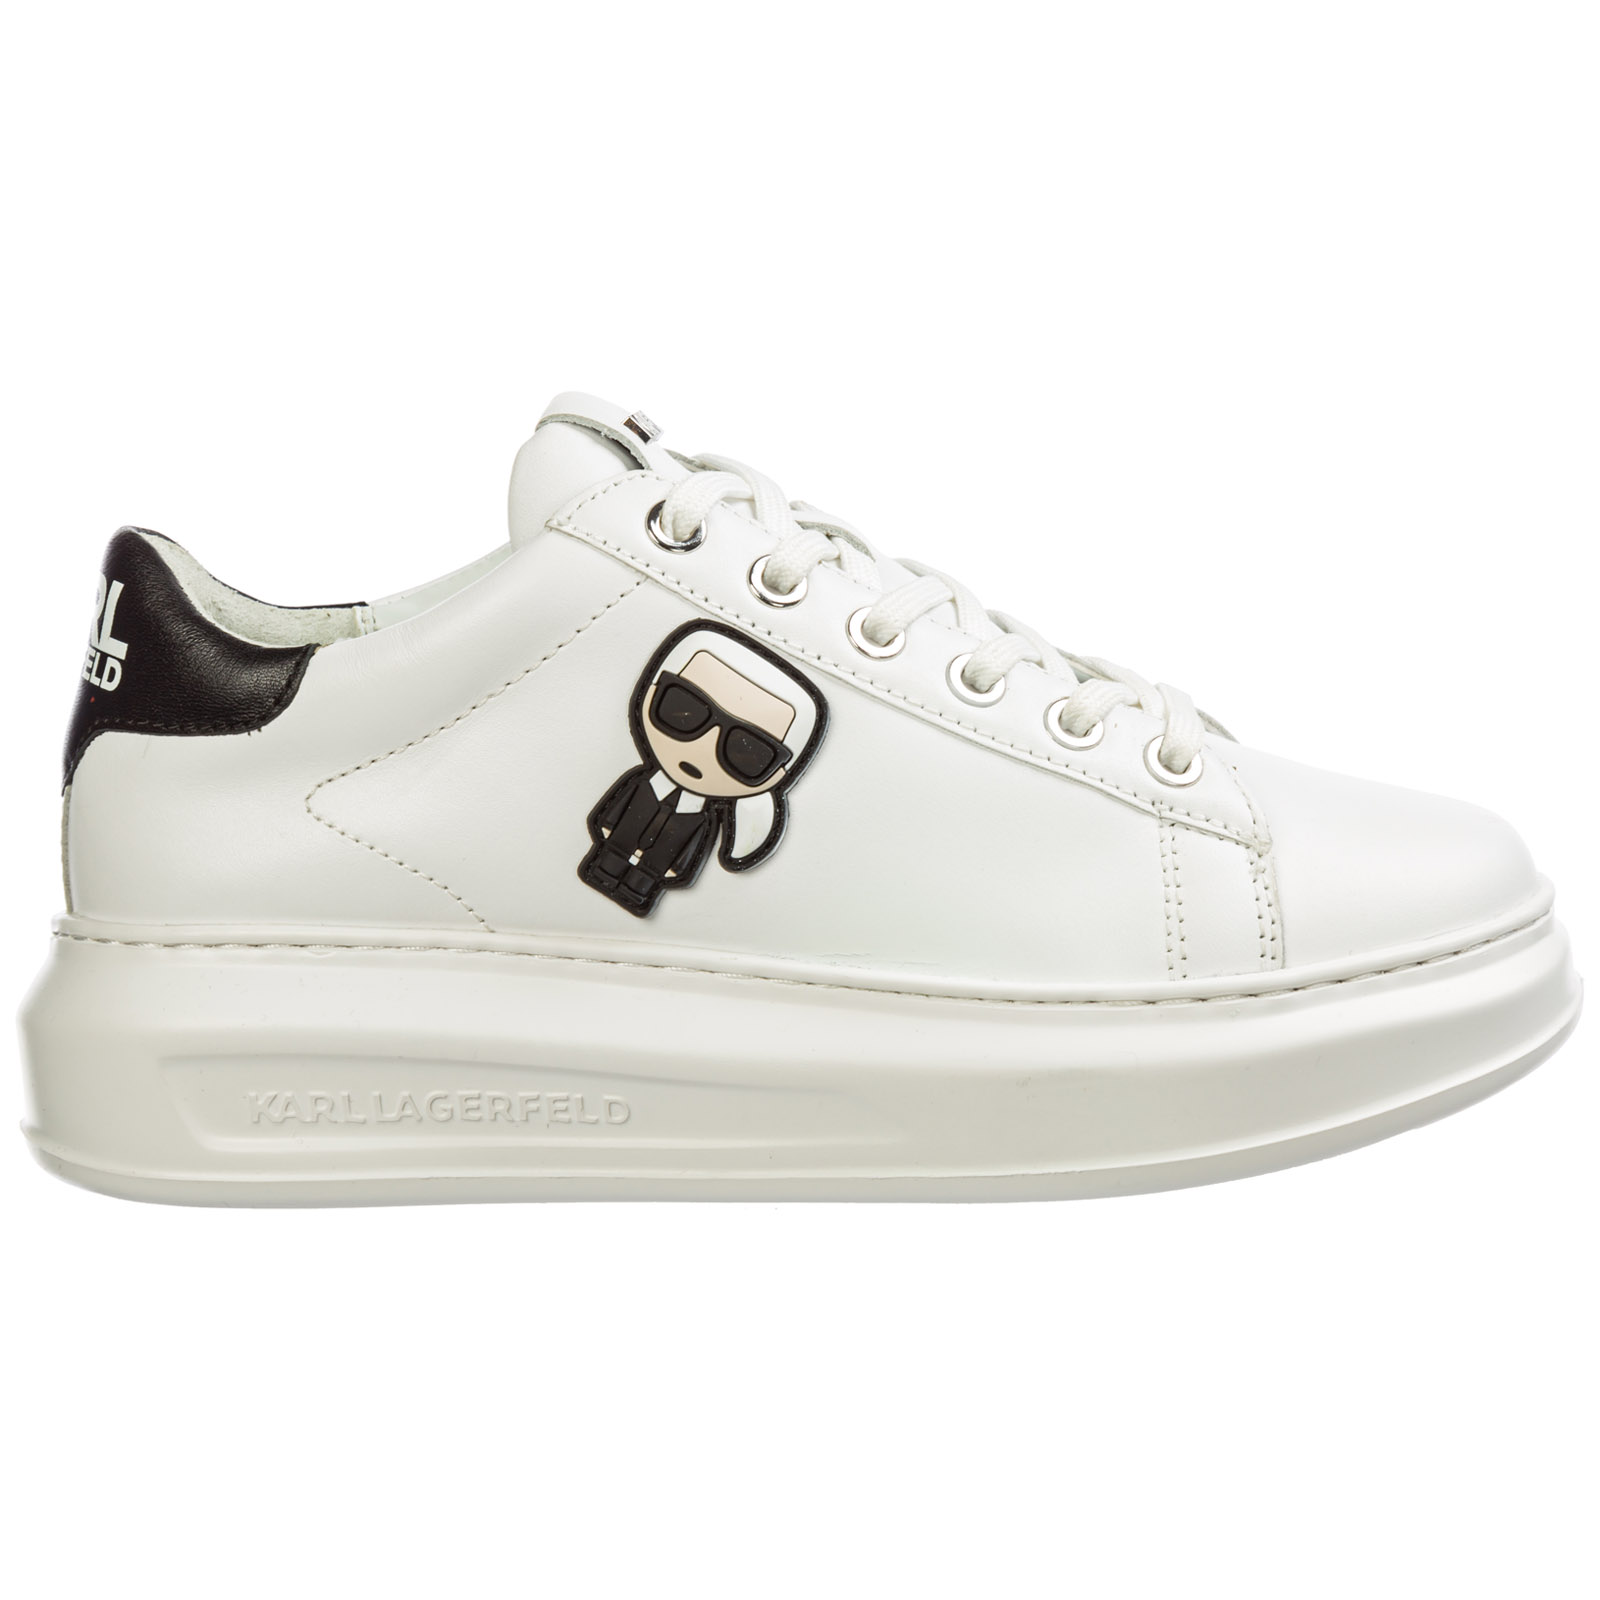 Women's shoes leather trainers sneakers kikonik kapri